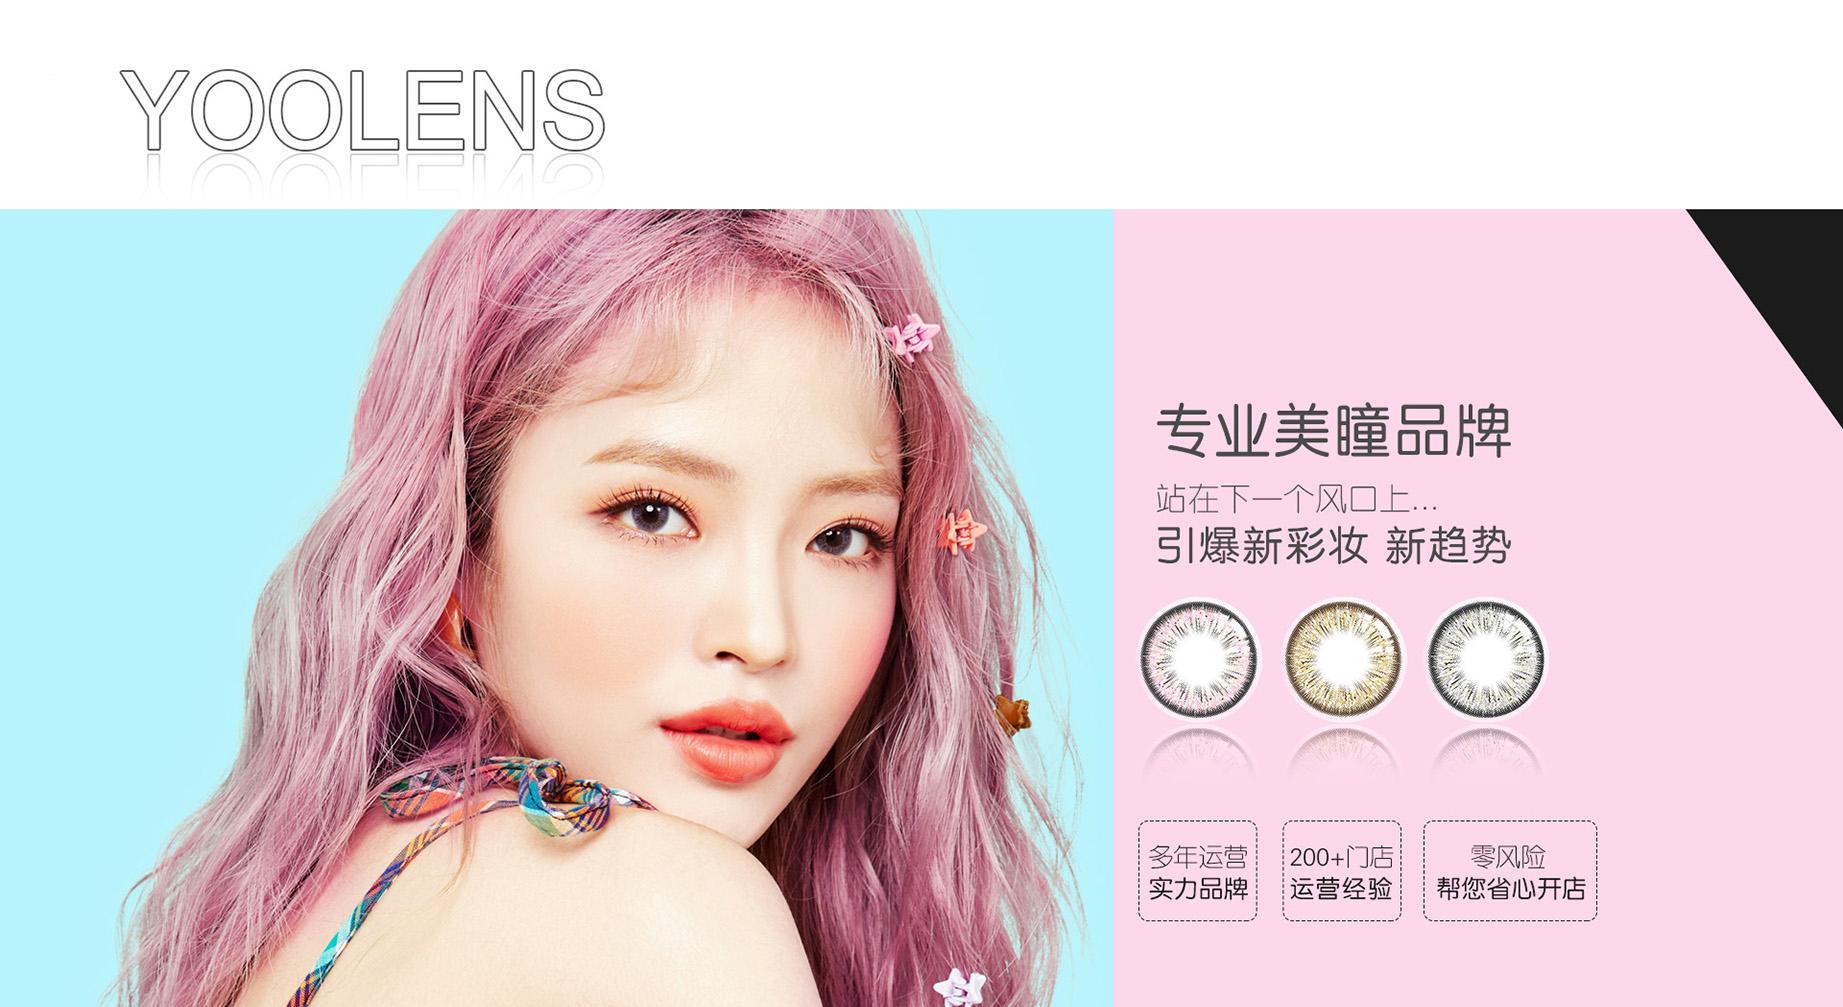 YOOLENS美目优瞳专业品牌,让加盟美瞳专卖店变得很简单